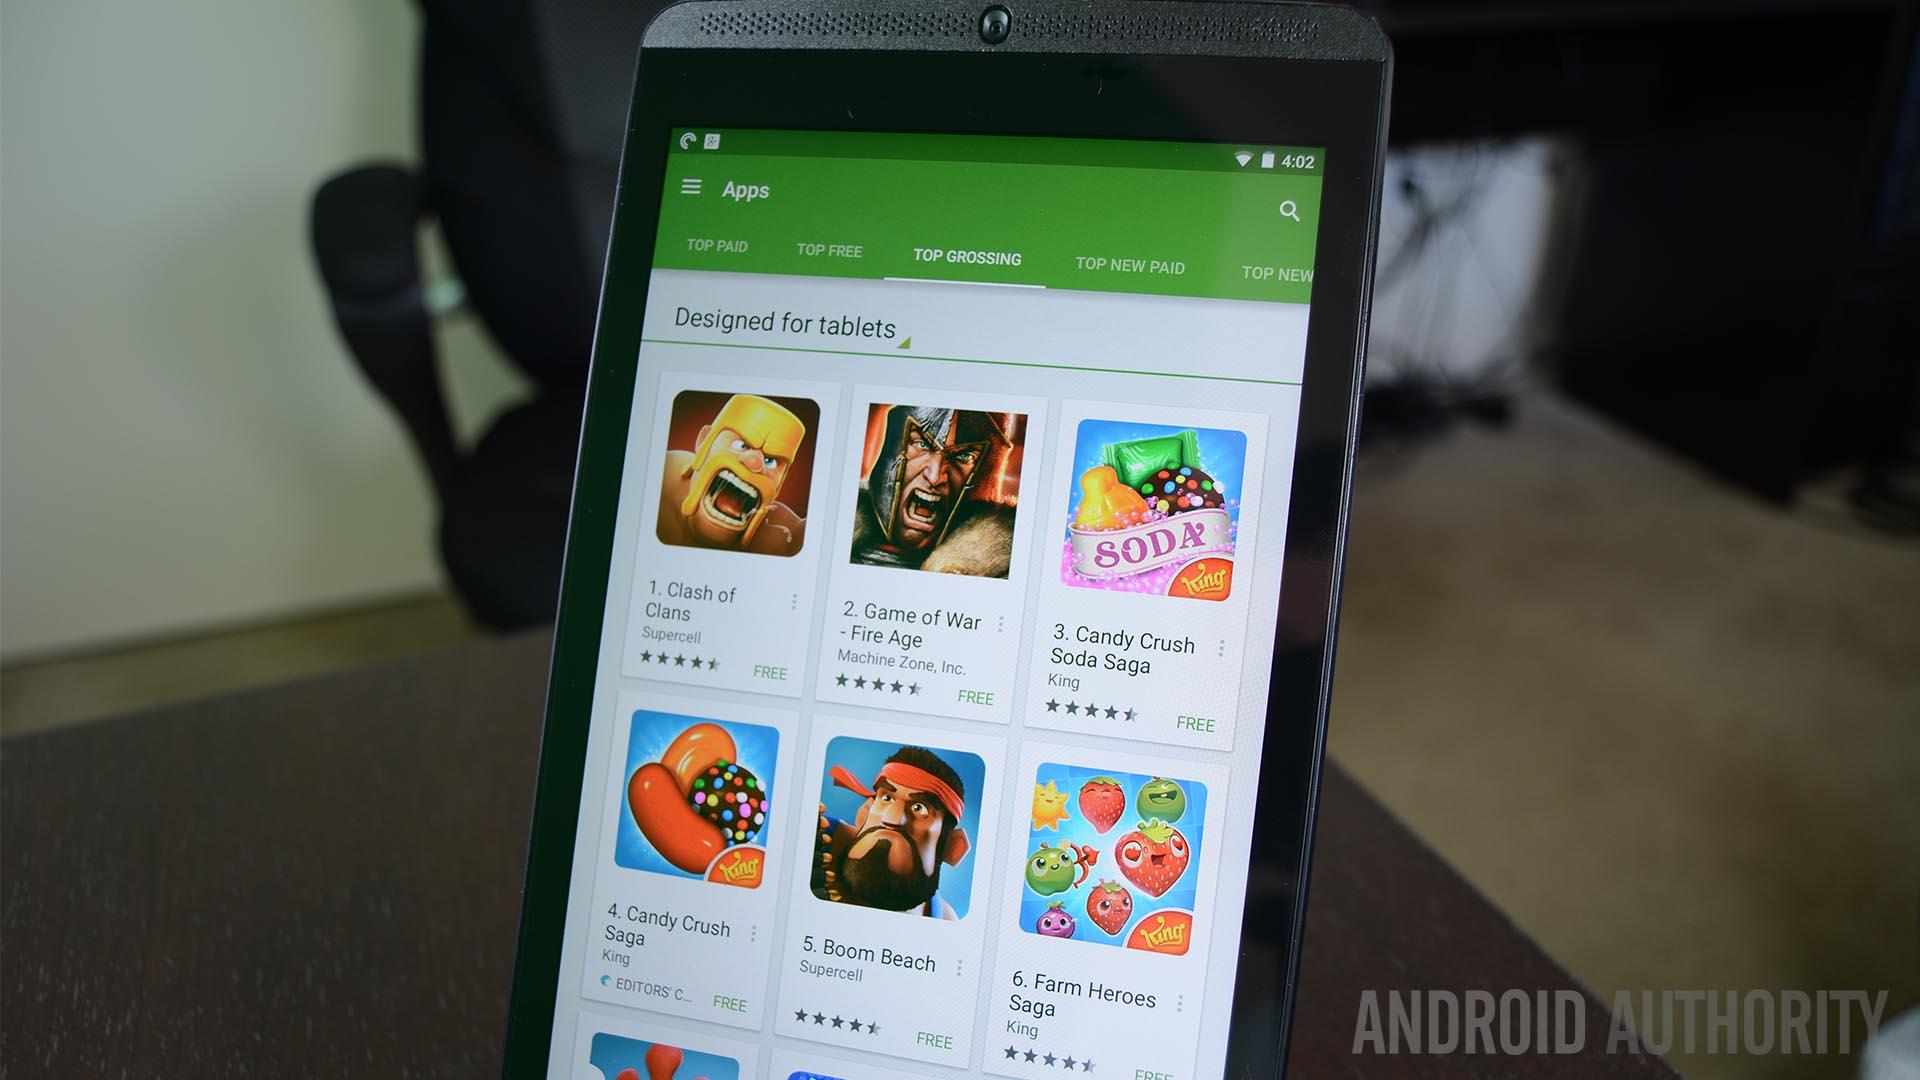 03 Google Play Store Watermarked